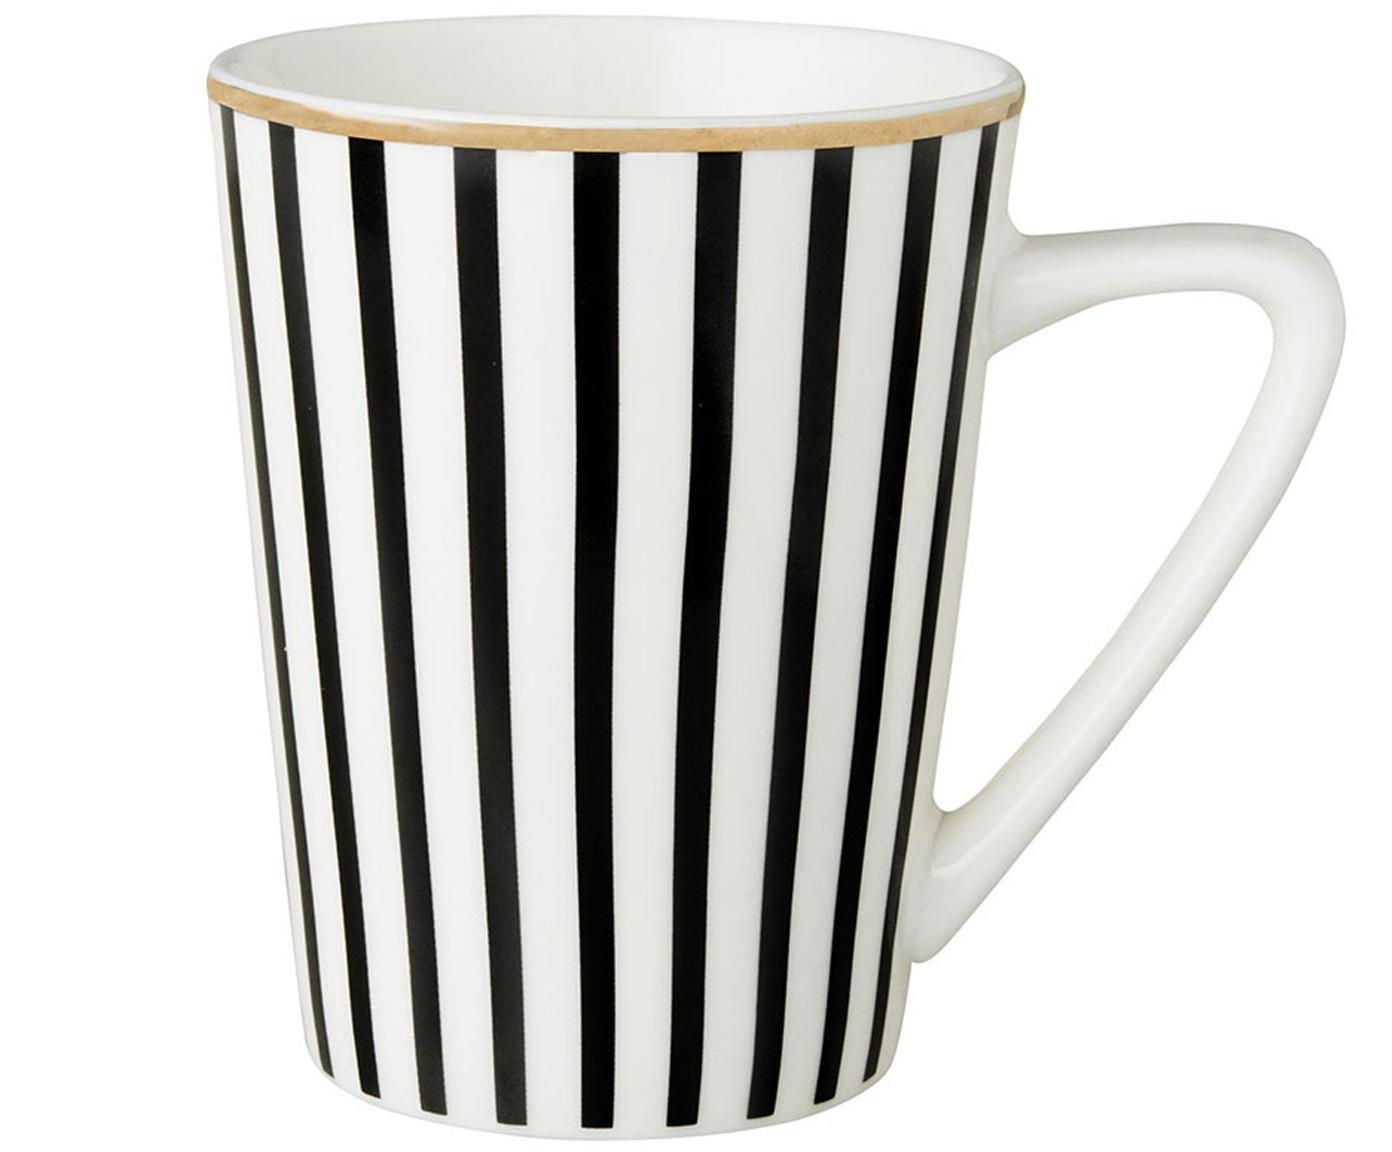 Tazas de té Pluto Loft, 4uds., Porcelana, Negro, blanco, Ø 8 x Al 10 cm